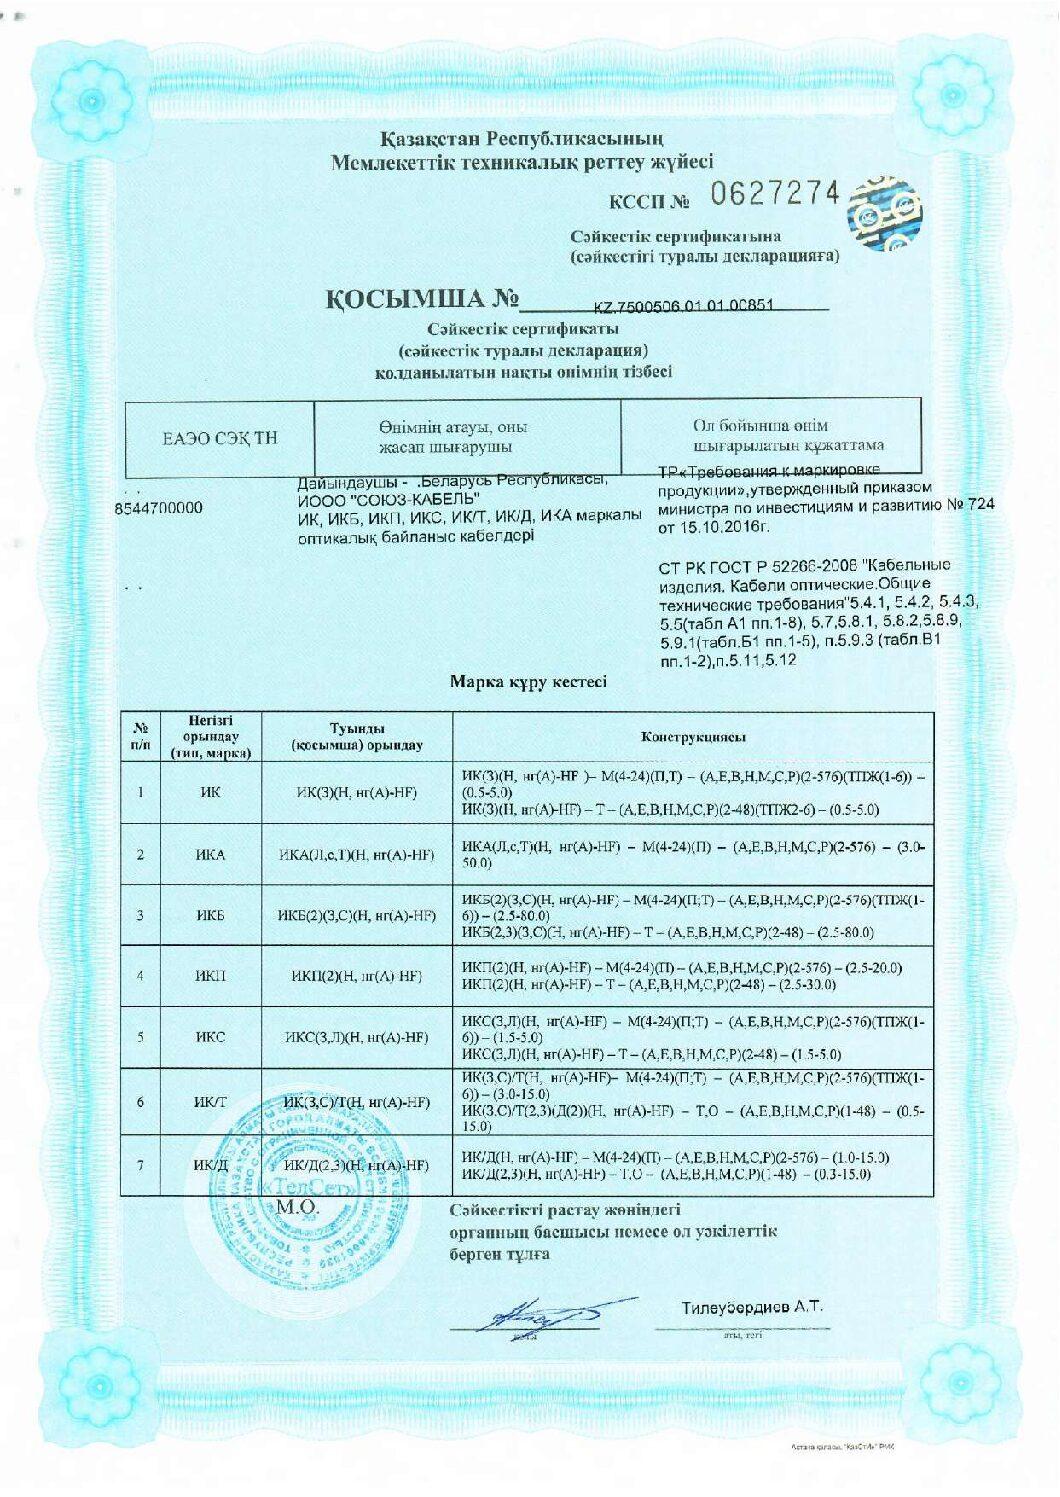 Сертификатқа қосымша